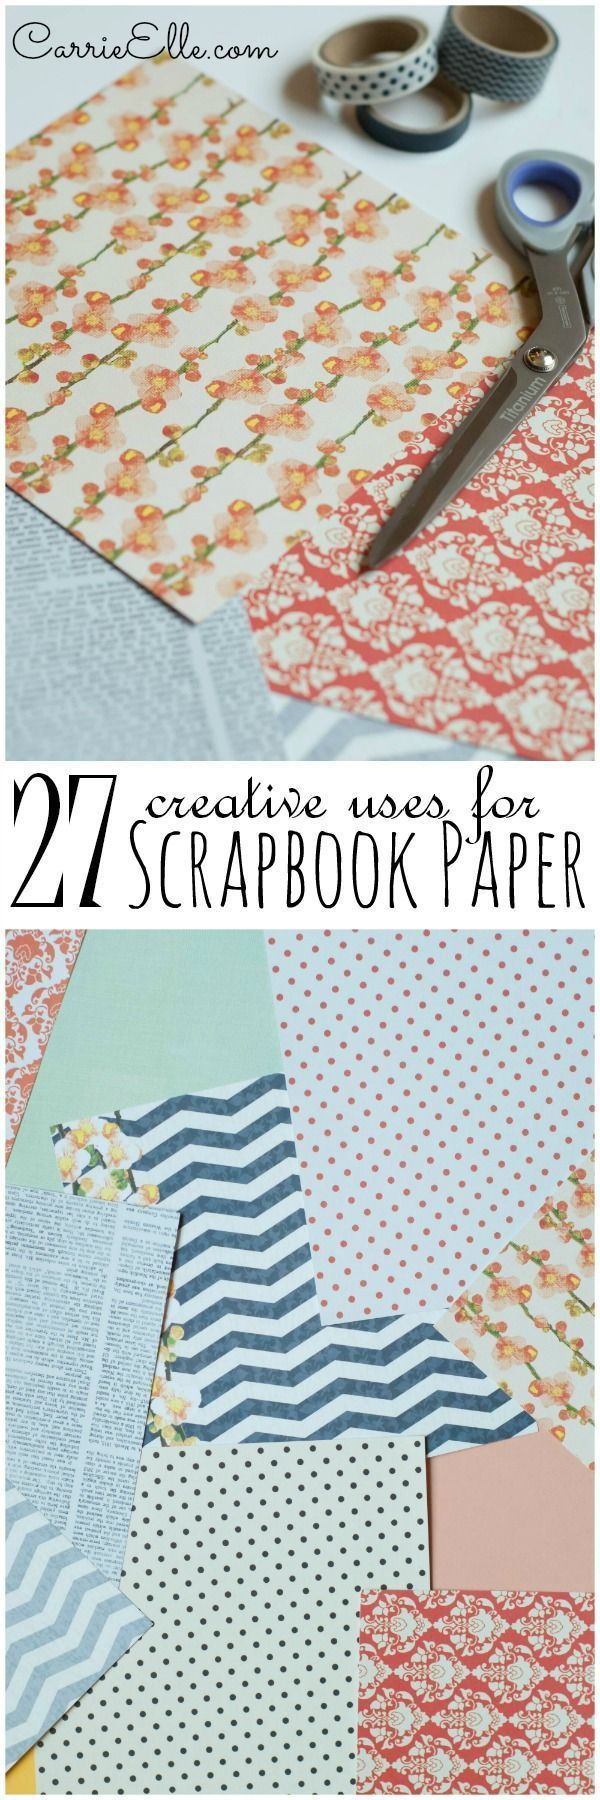 Scrapbook paper art ideas - 27 Uses For Scrapbook Paper